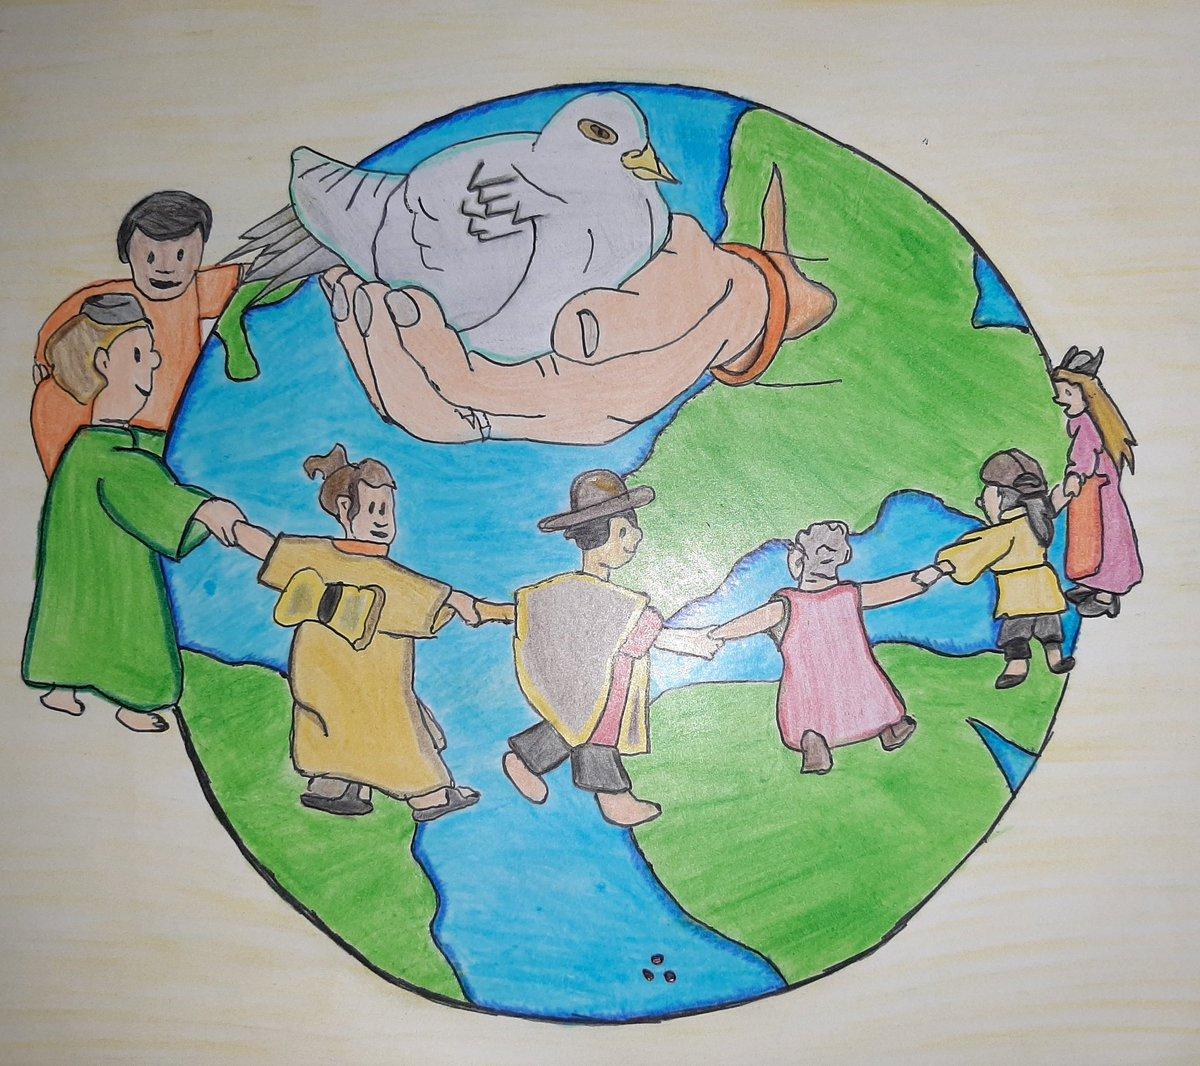 Cecyteh Zimapan On Twitter Paz2030 Dibujo Representando